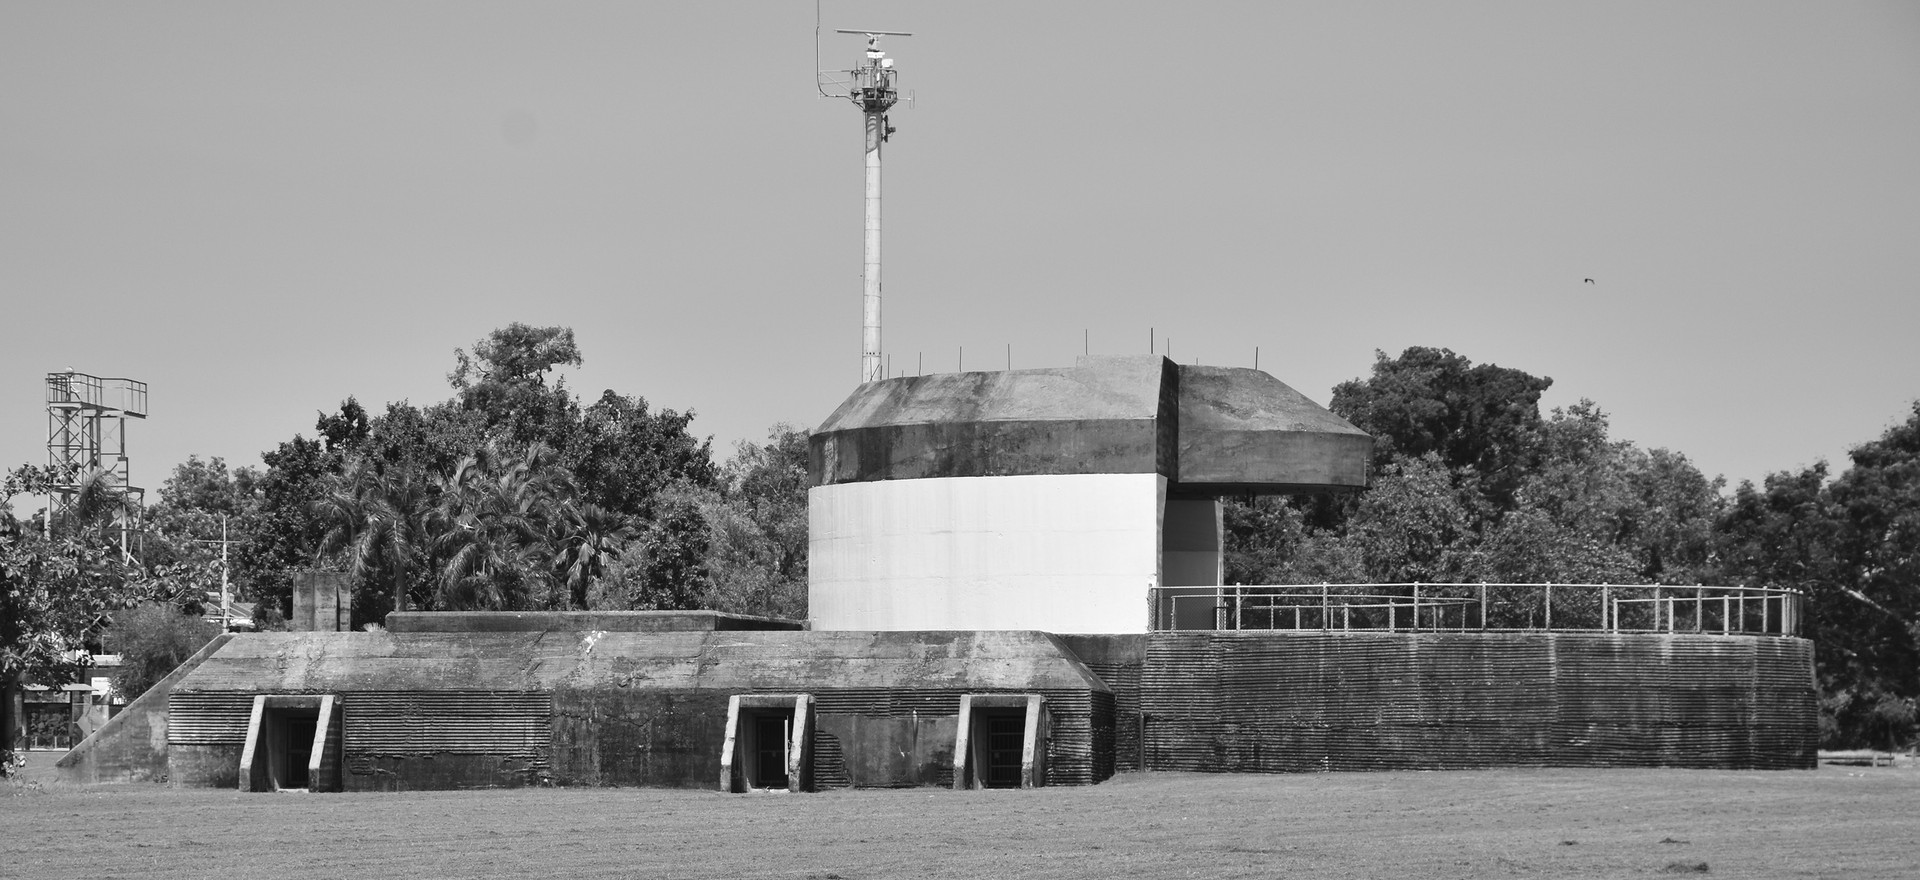 WW II 9.2-inch gun emplacement, East Point.